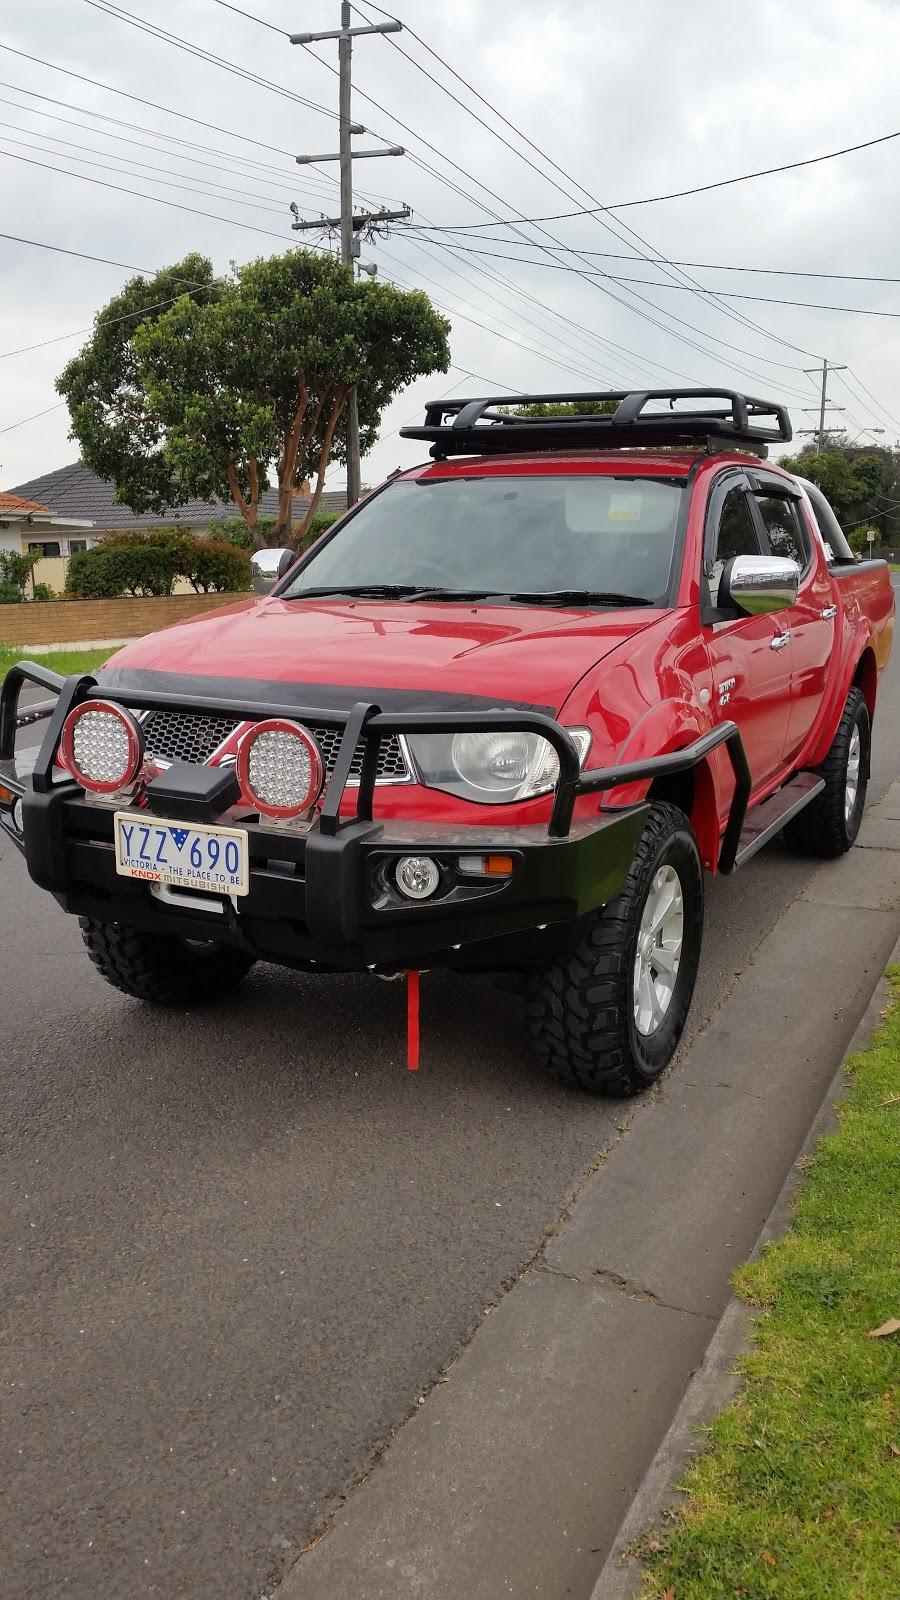 Roadrunner Autos   car dealer   401 Blackshaws Rd, Altona North VIC 3025, Australia   0393251150 OR +61 3 9325 1150